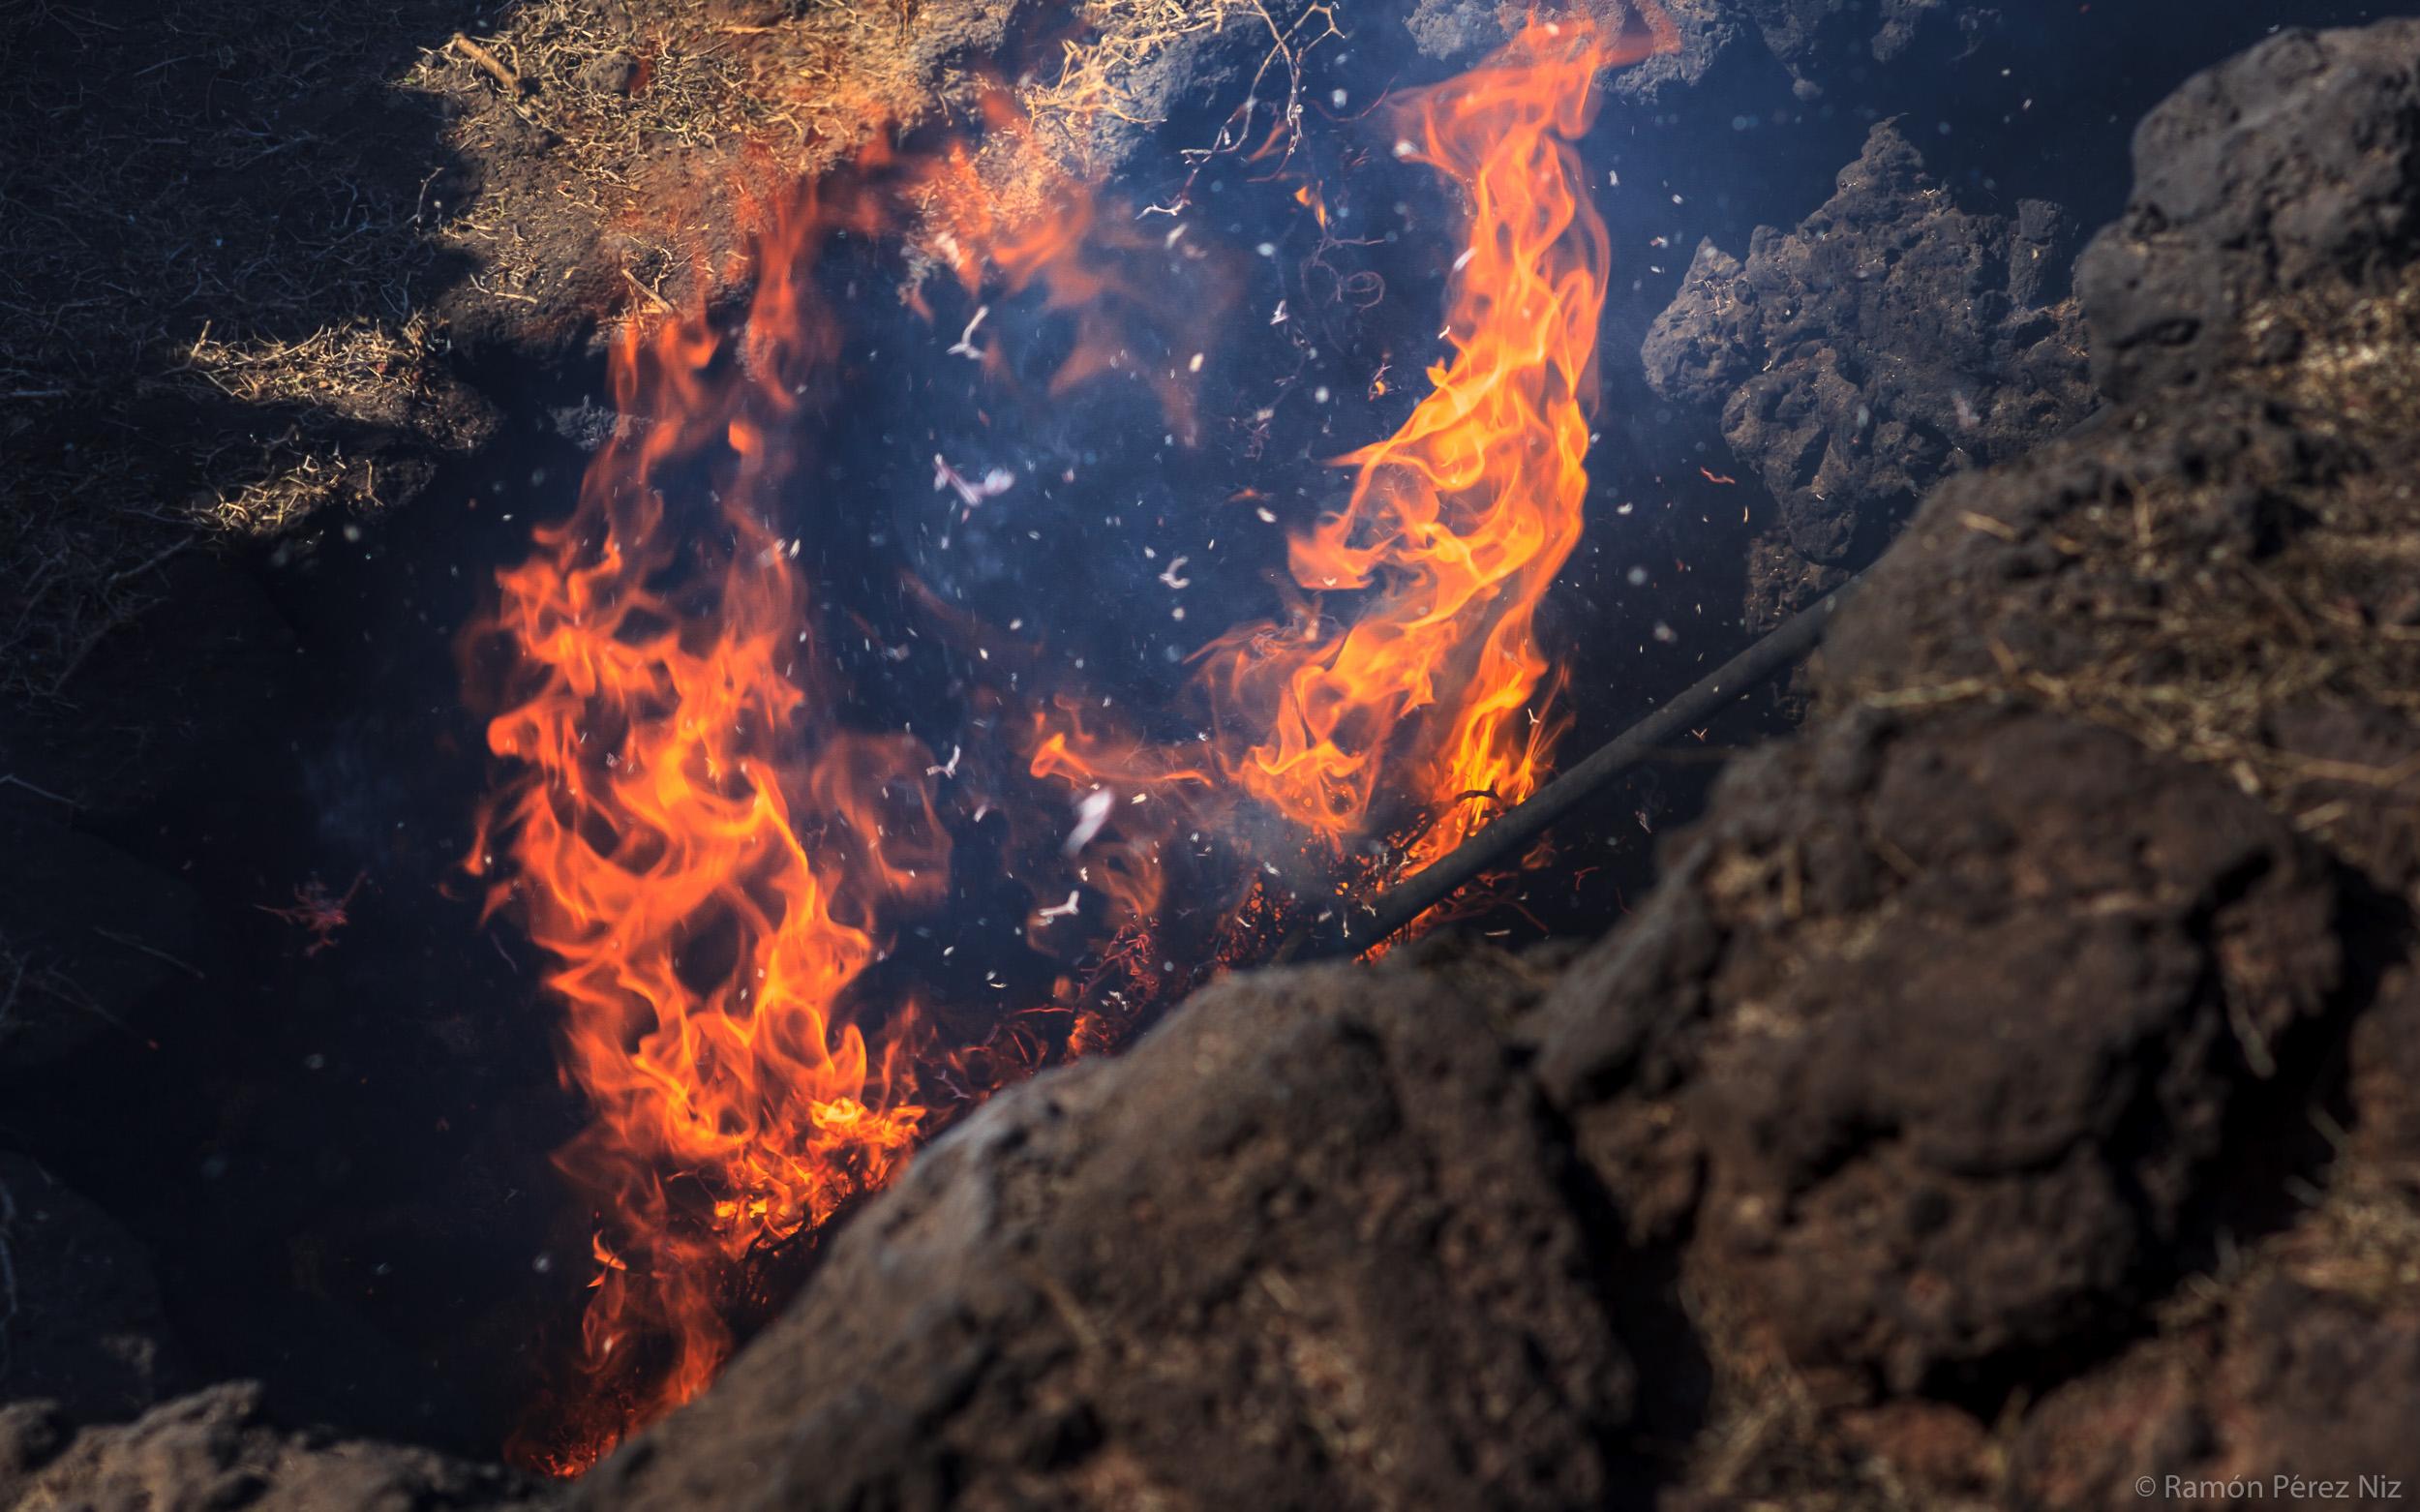 Foto de Ramón Pérez Niz, fuego I